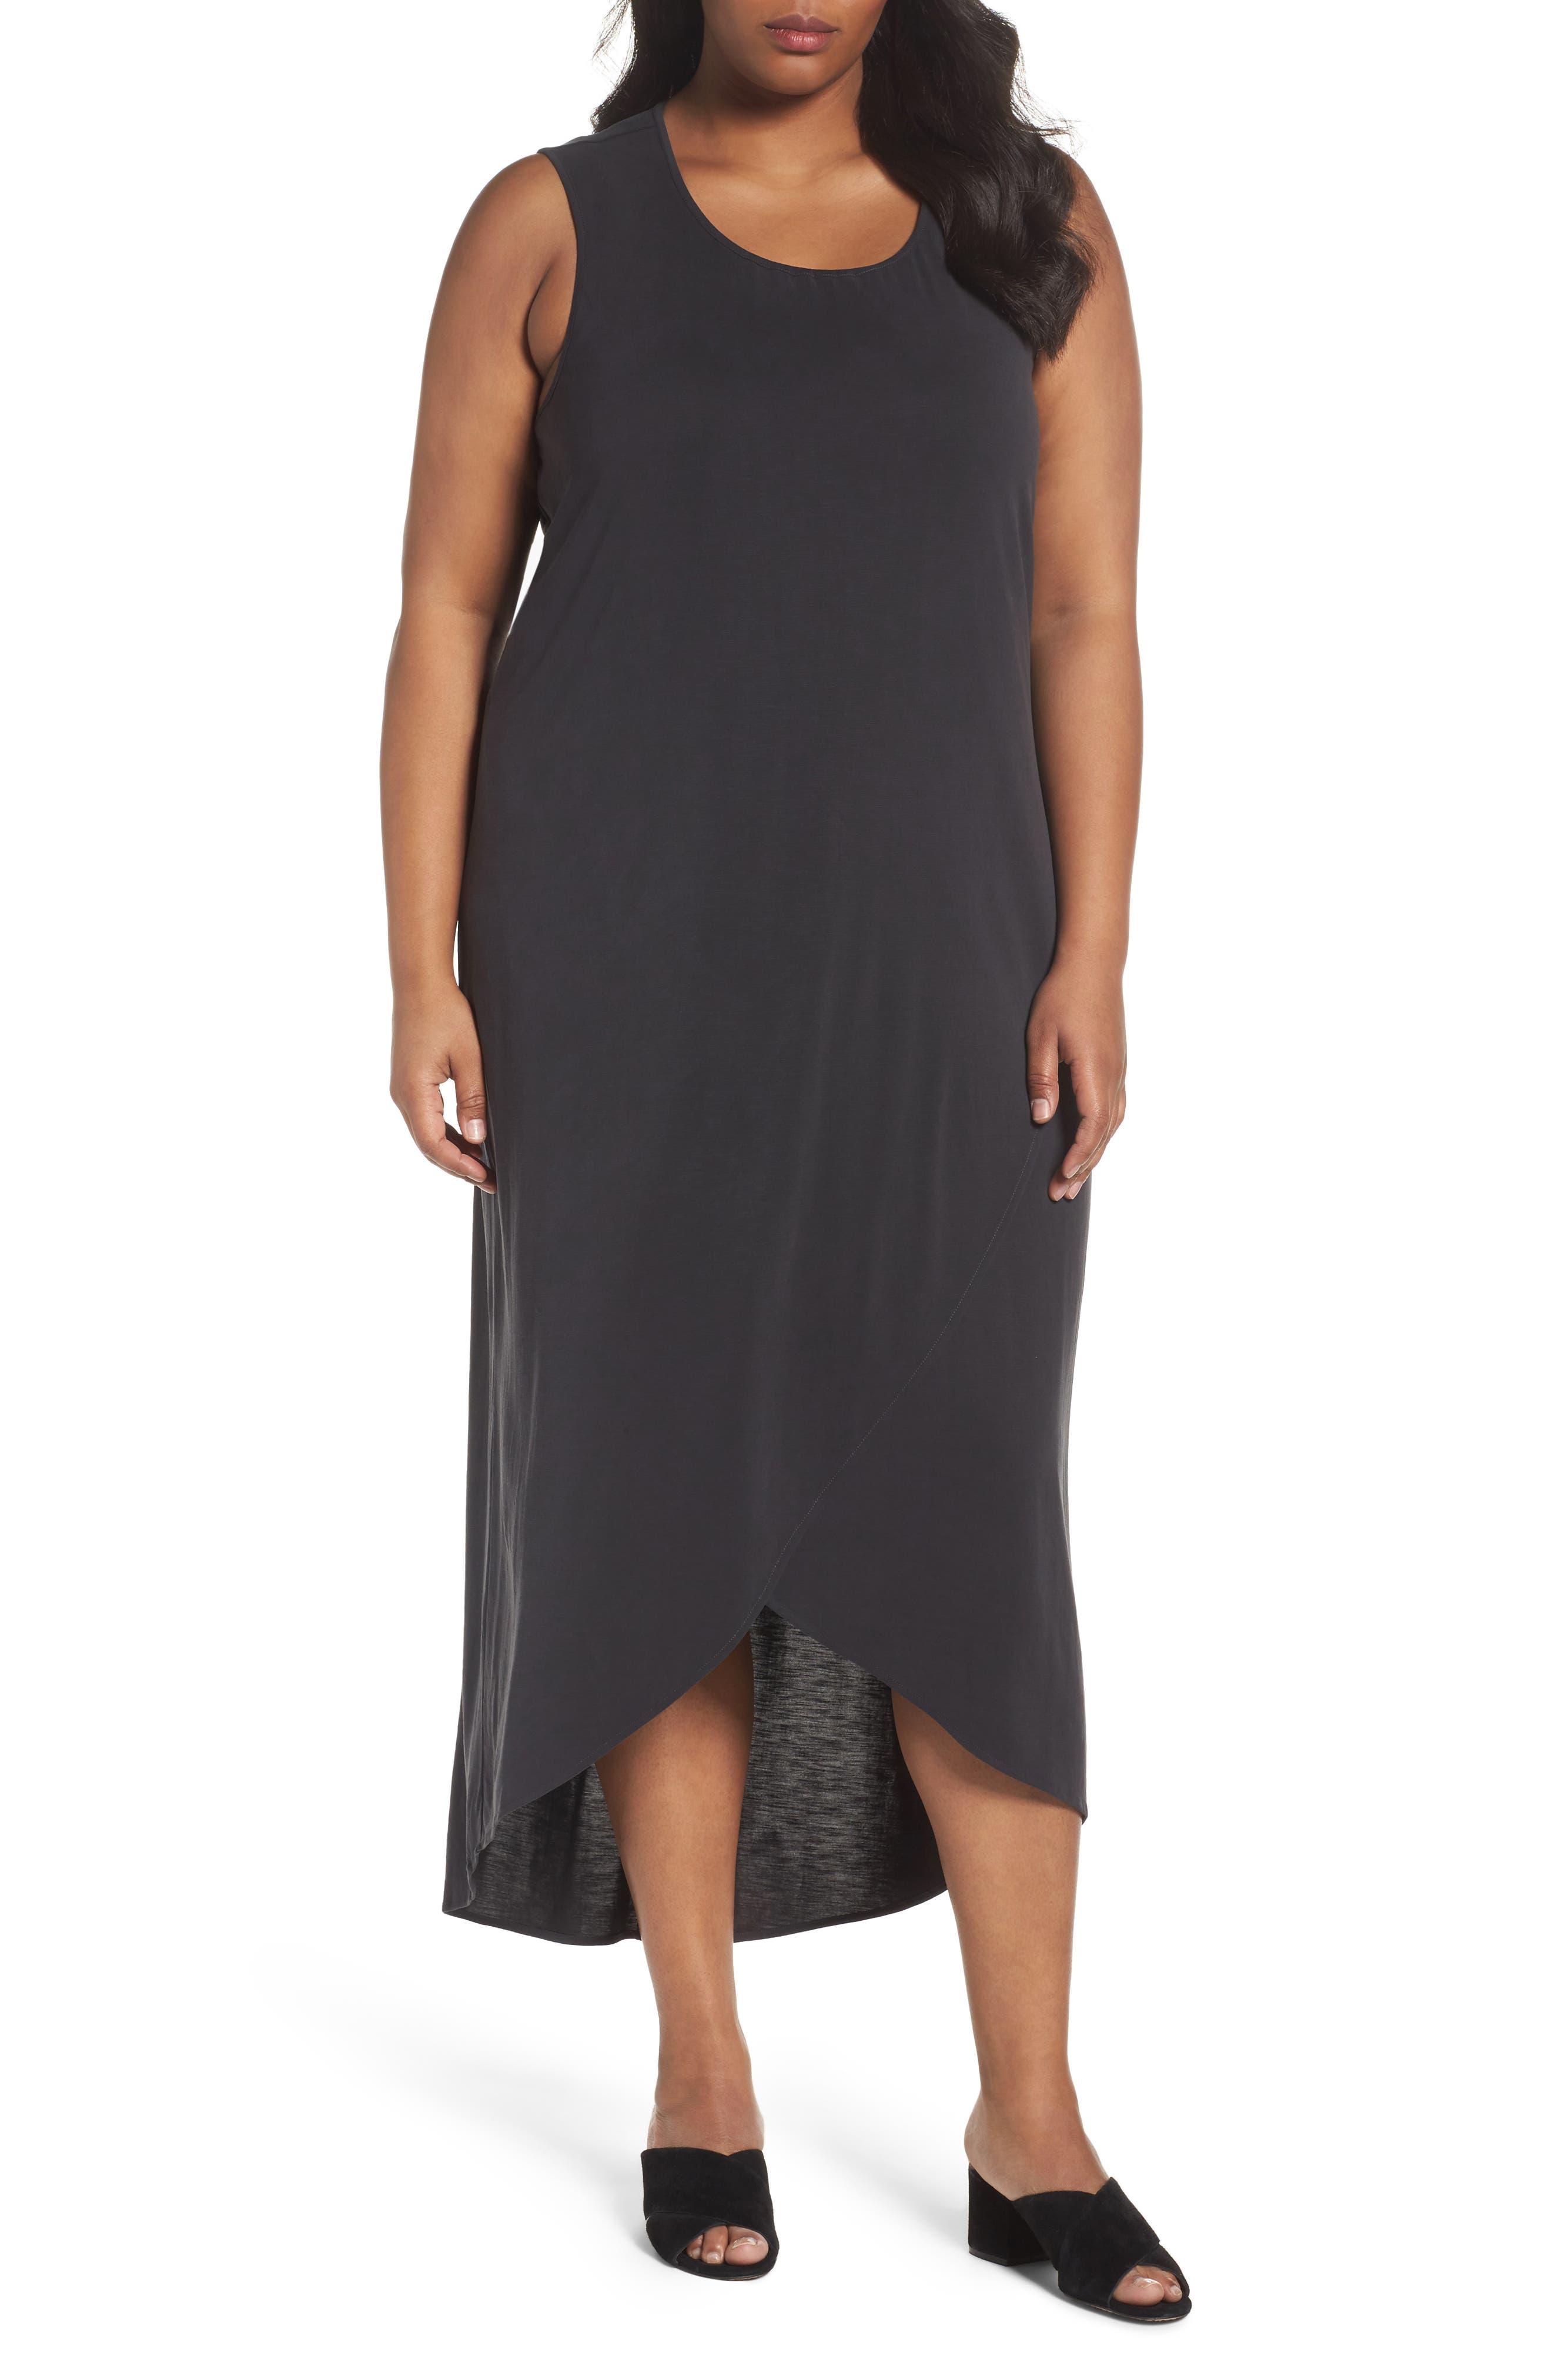 Alternate Image 1 Selected - NIC+ZOE Boardwalk Jersey High/Low Dress (Plus Size)